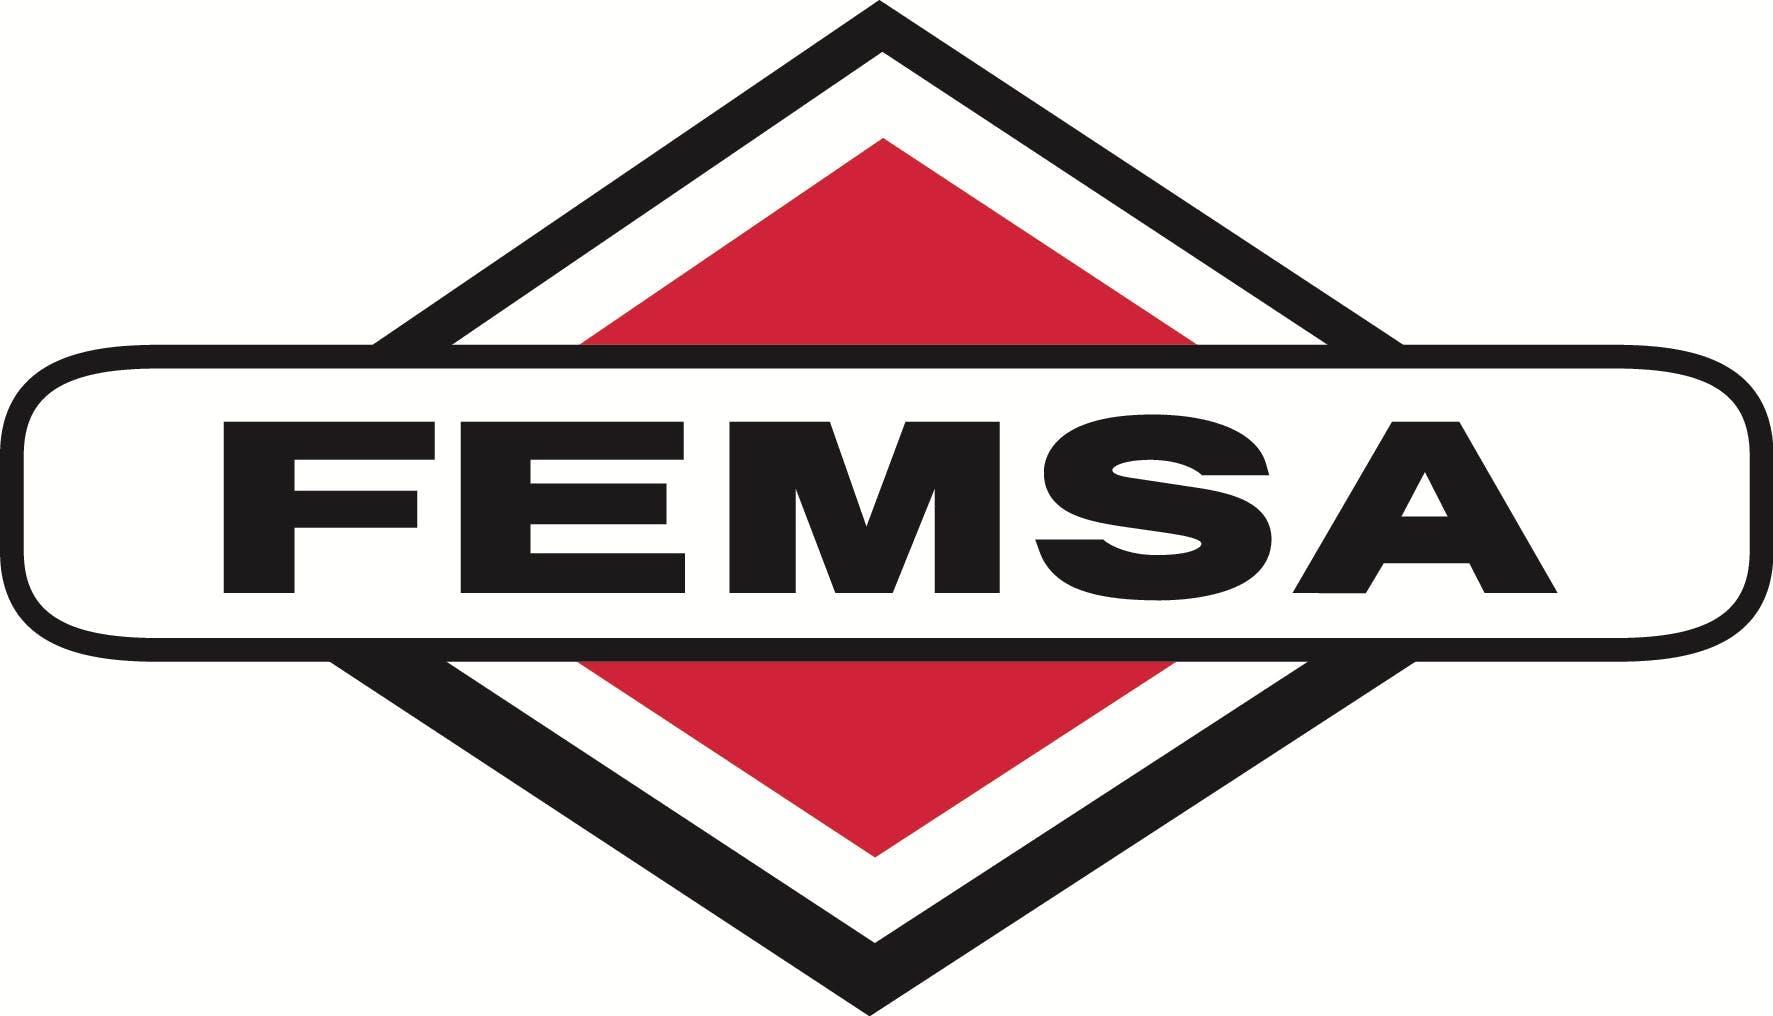 Photo of FEMSA logo